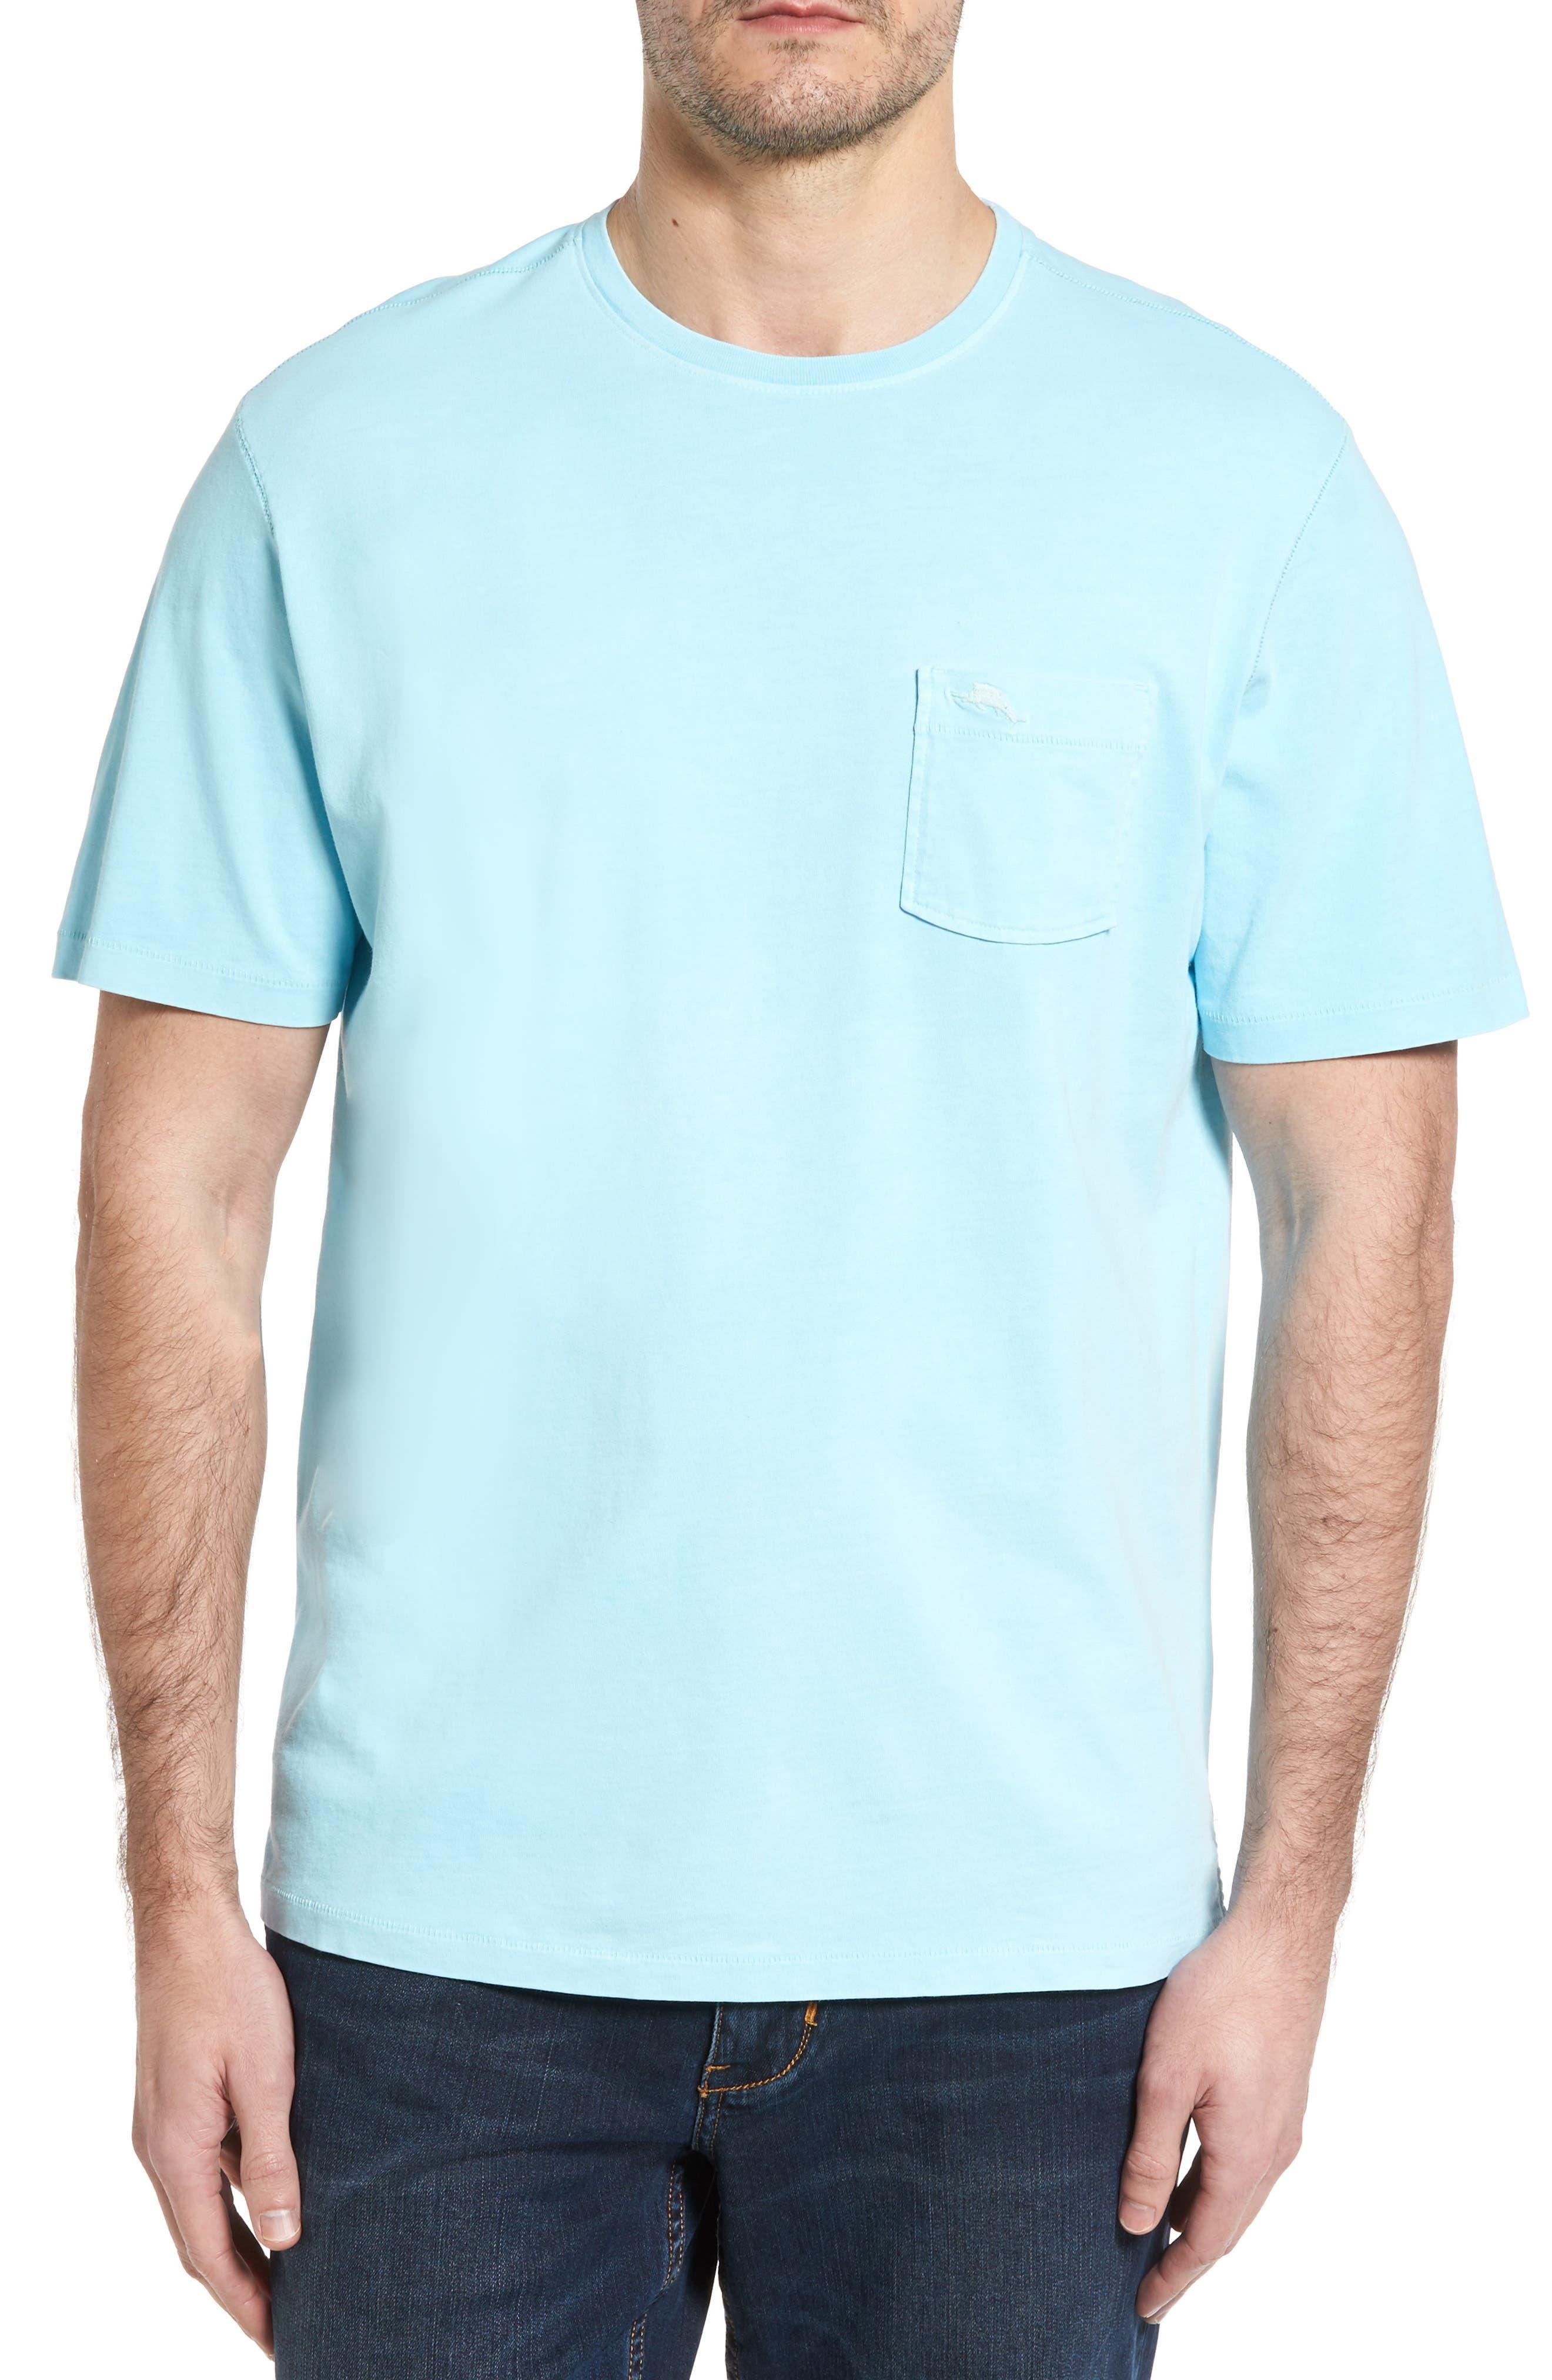 Tommy Bahama 'New Bahama Reef' Island Modern Fit Pima Cotton Pocket T-Shirt